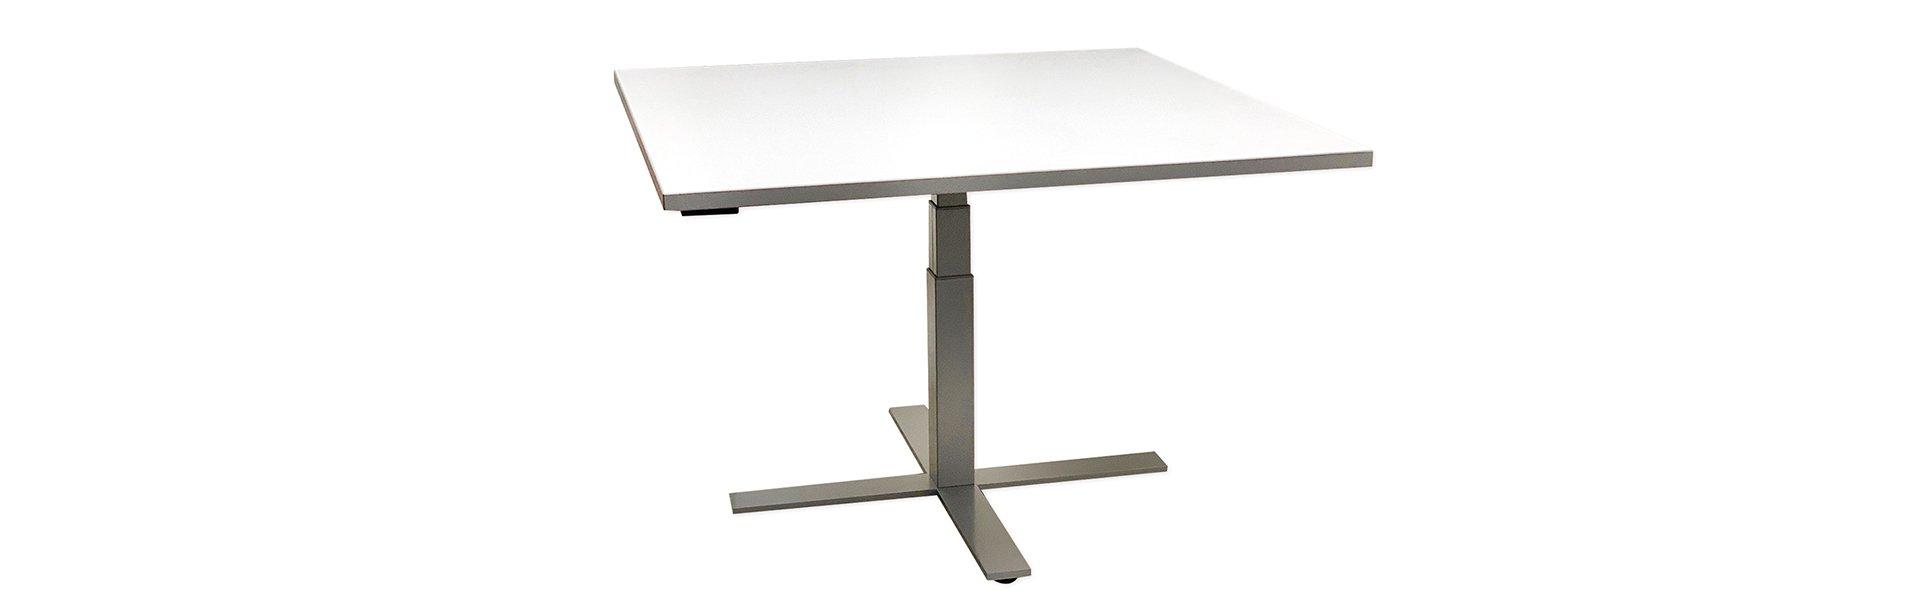 CFC Educational 667 Transformer Table